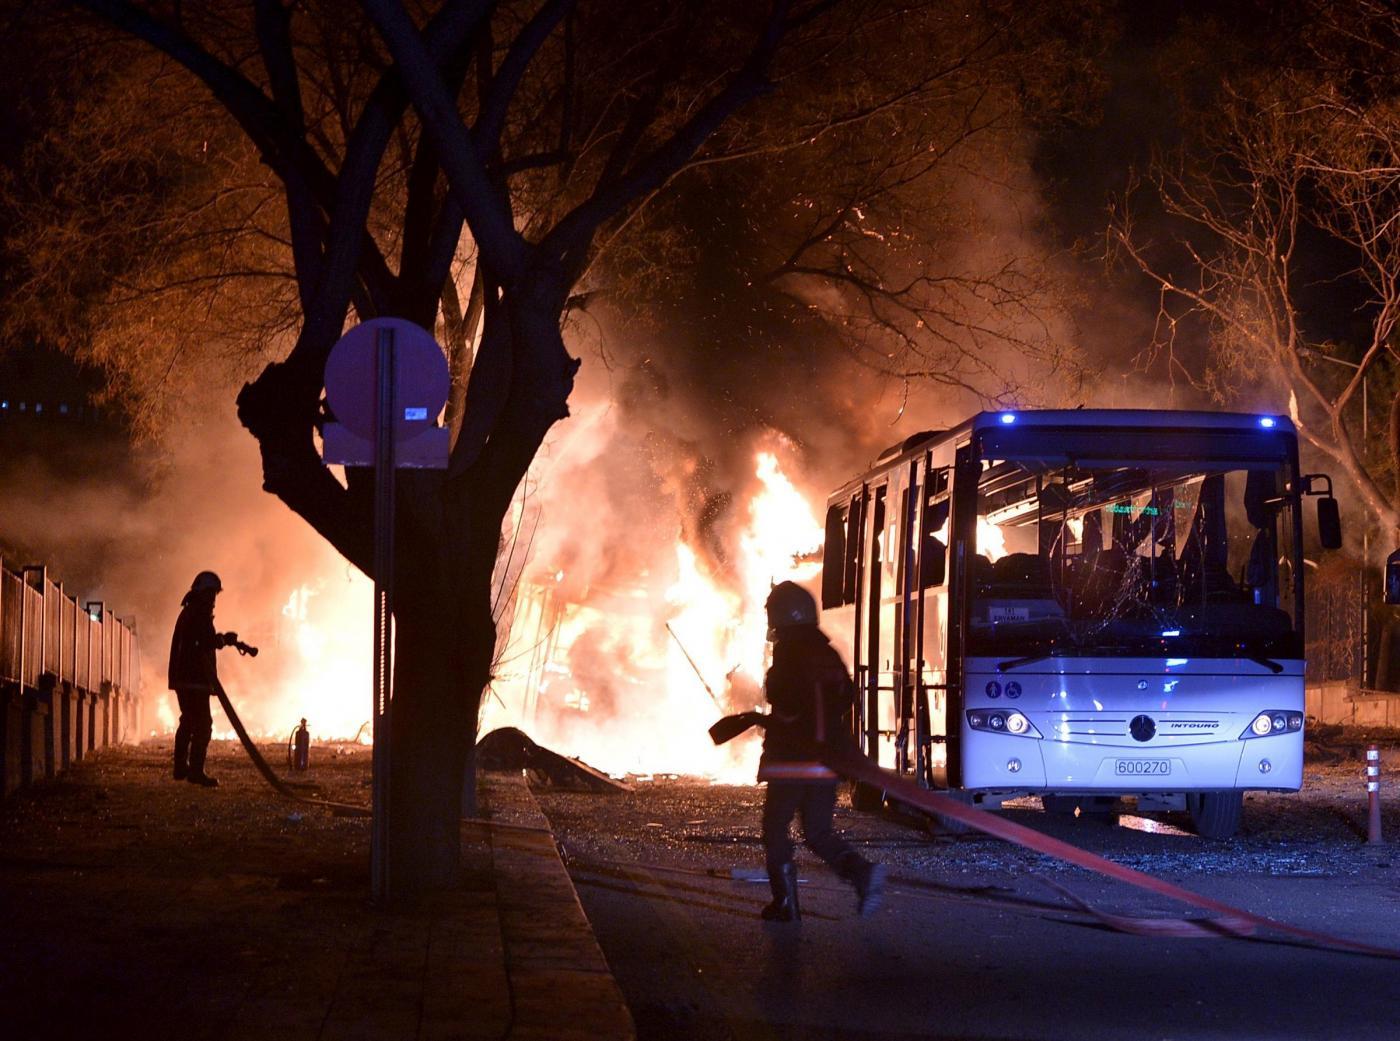 Strage di soldati in Turchia - GEOPOLITICA.info